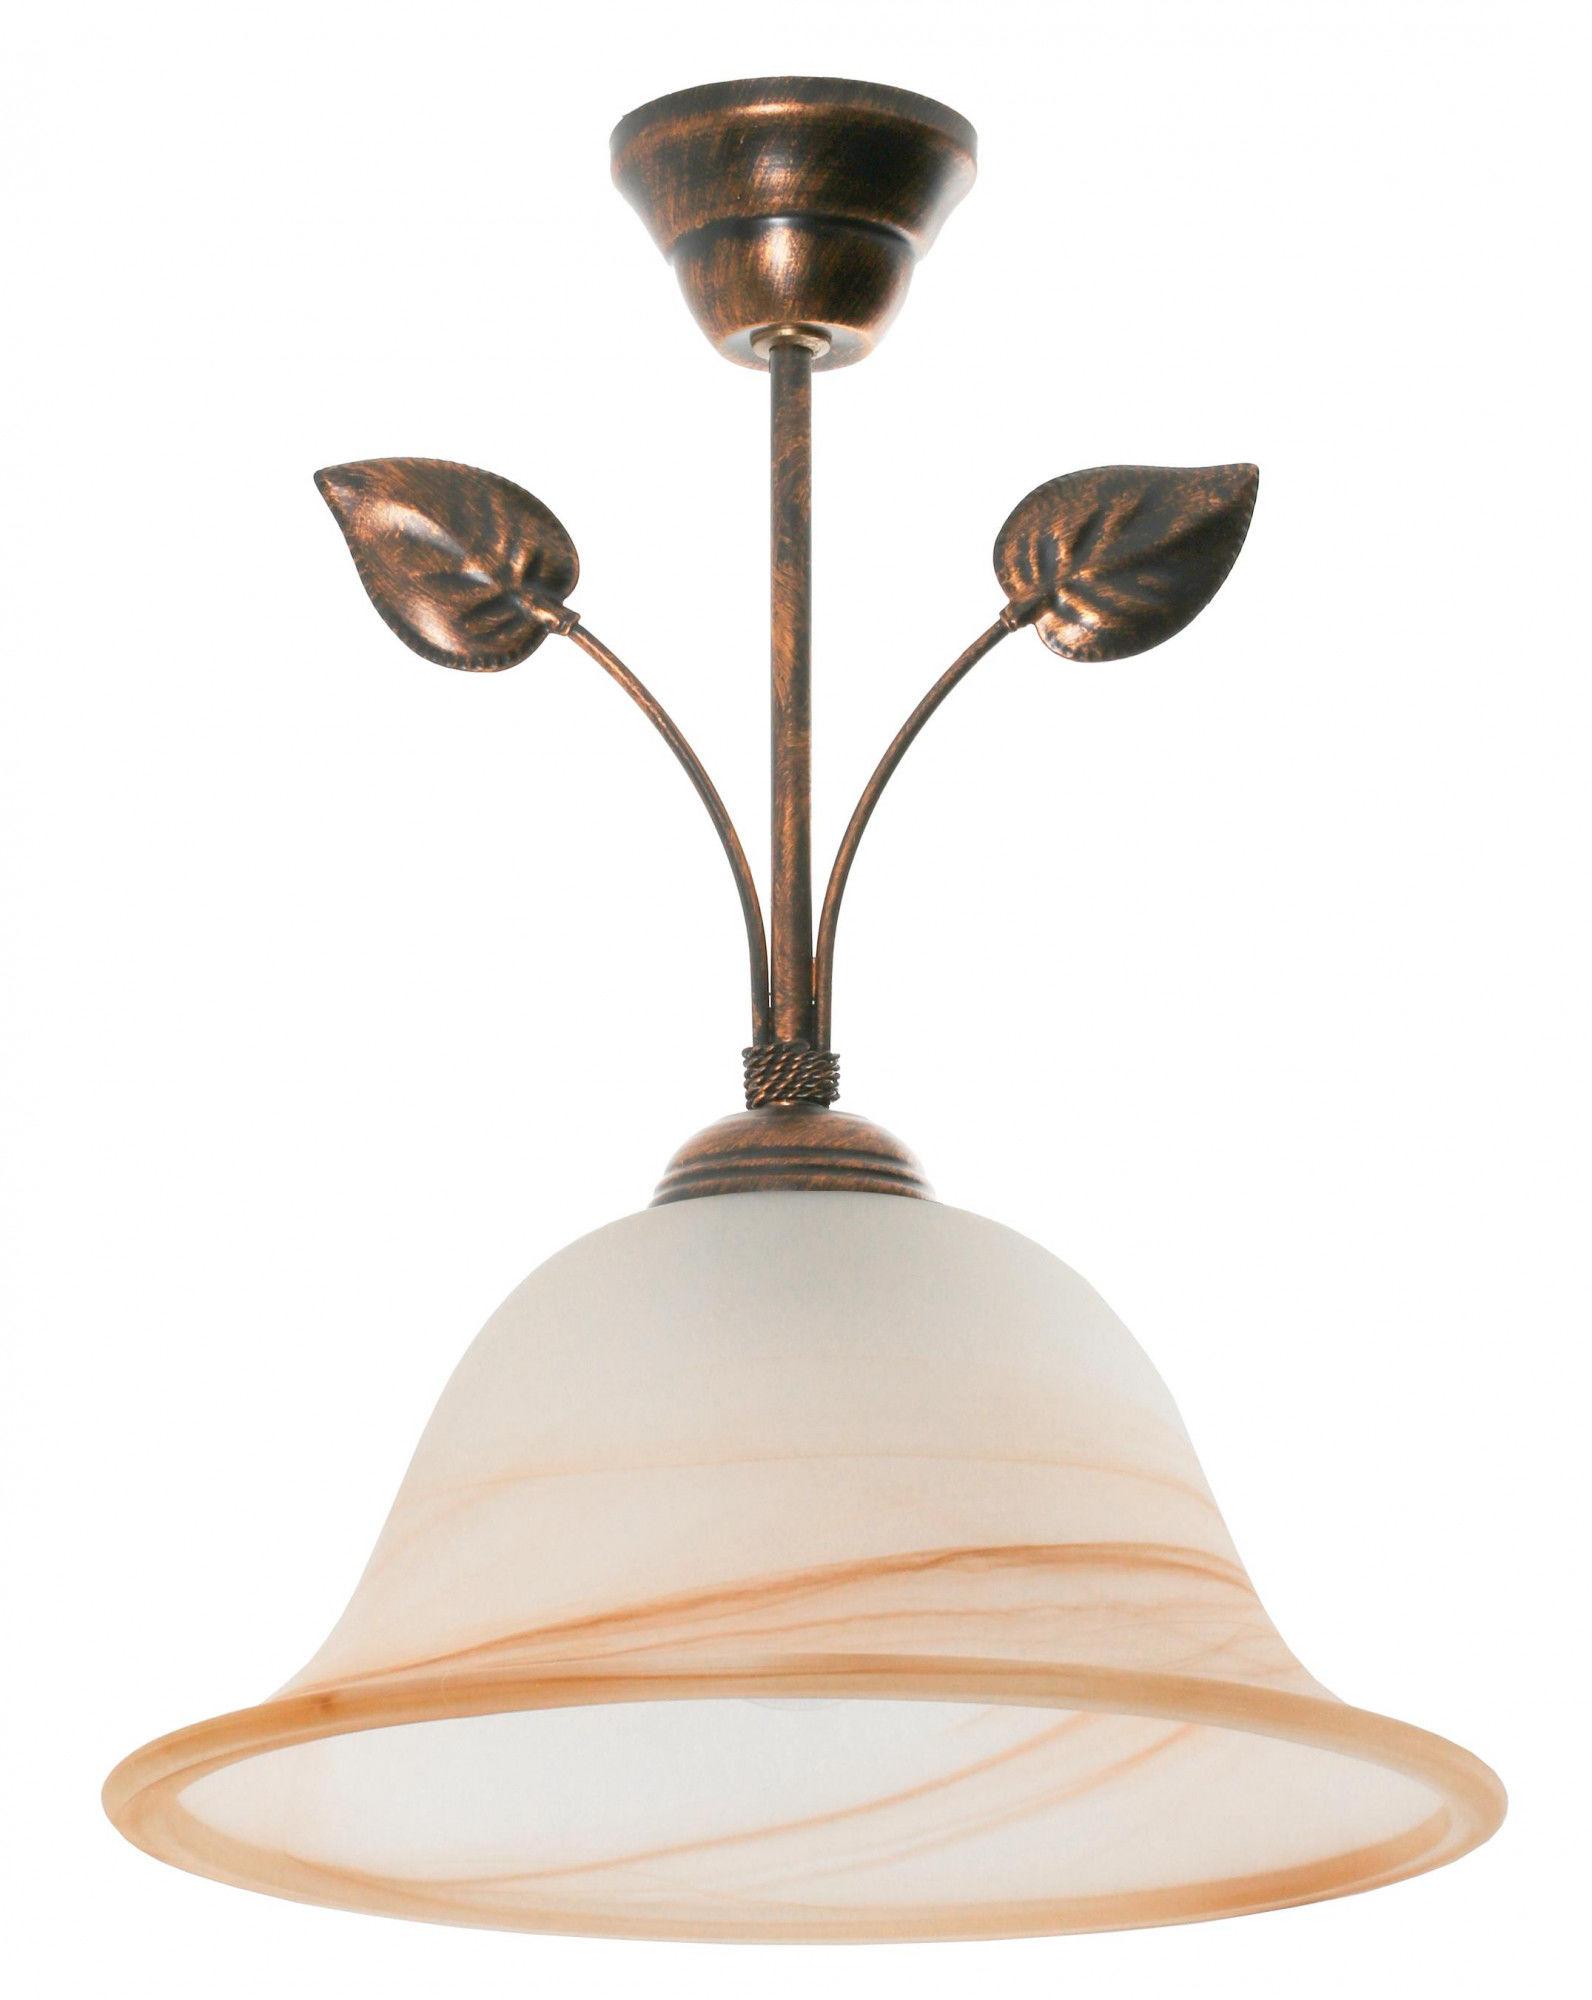 Lampa sufitowa kwiaty